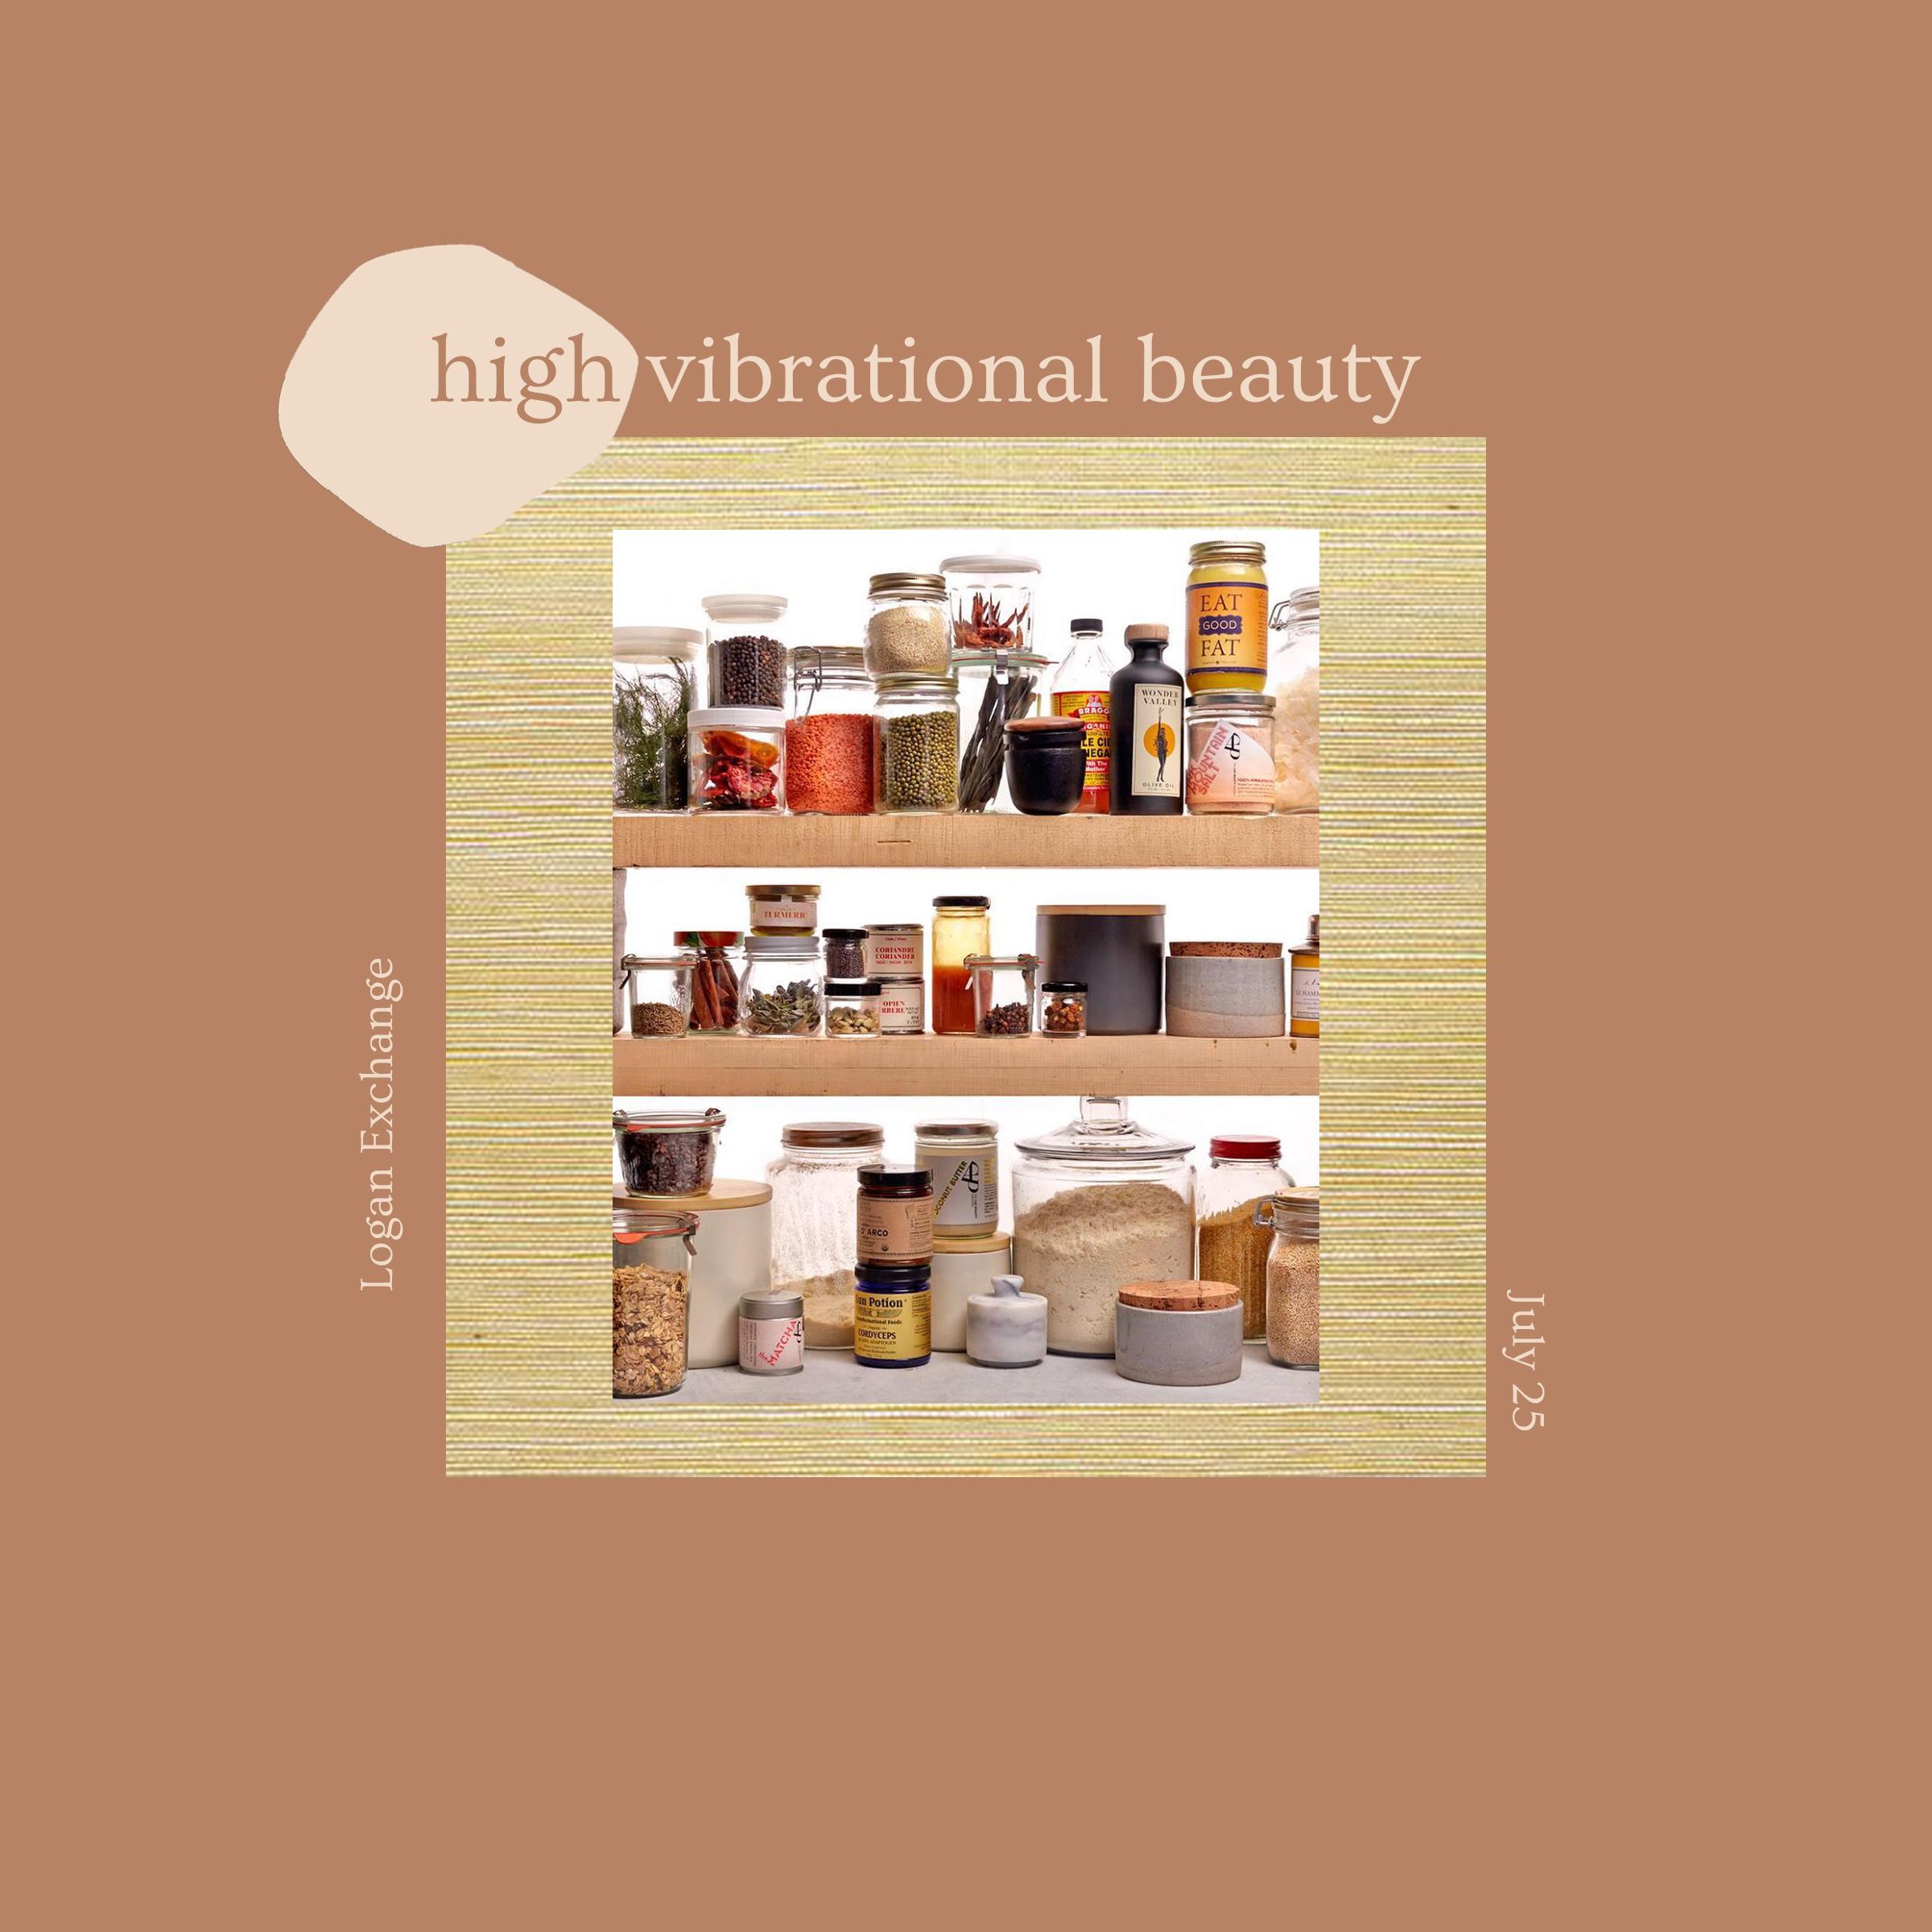 highvibrationalbeauty (1).jpg